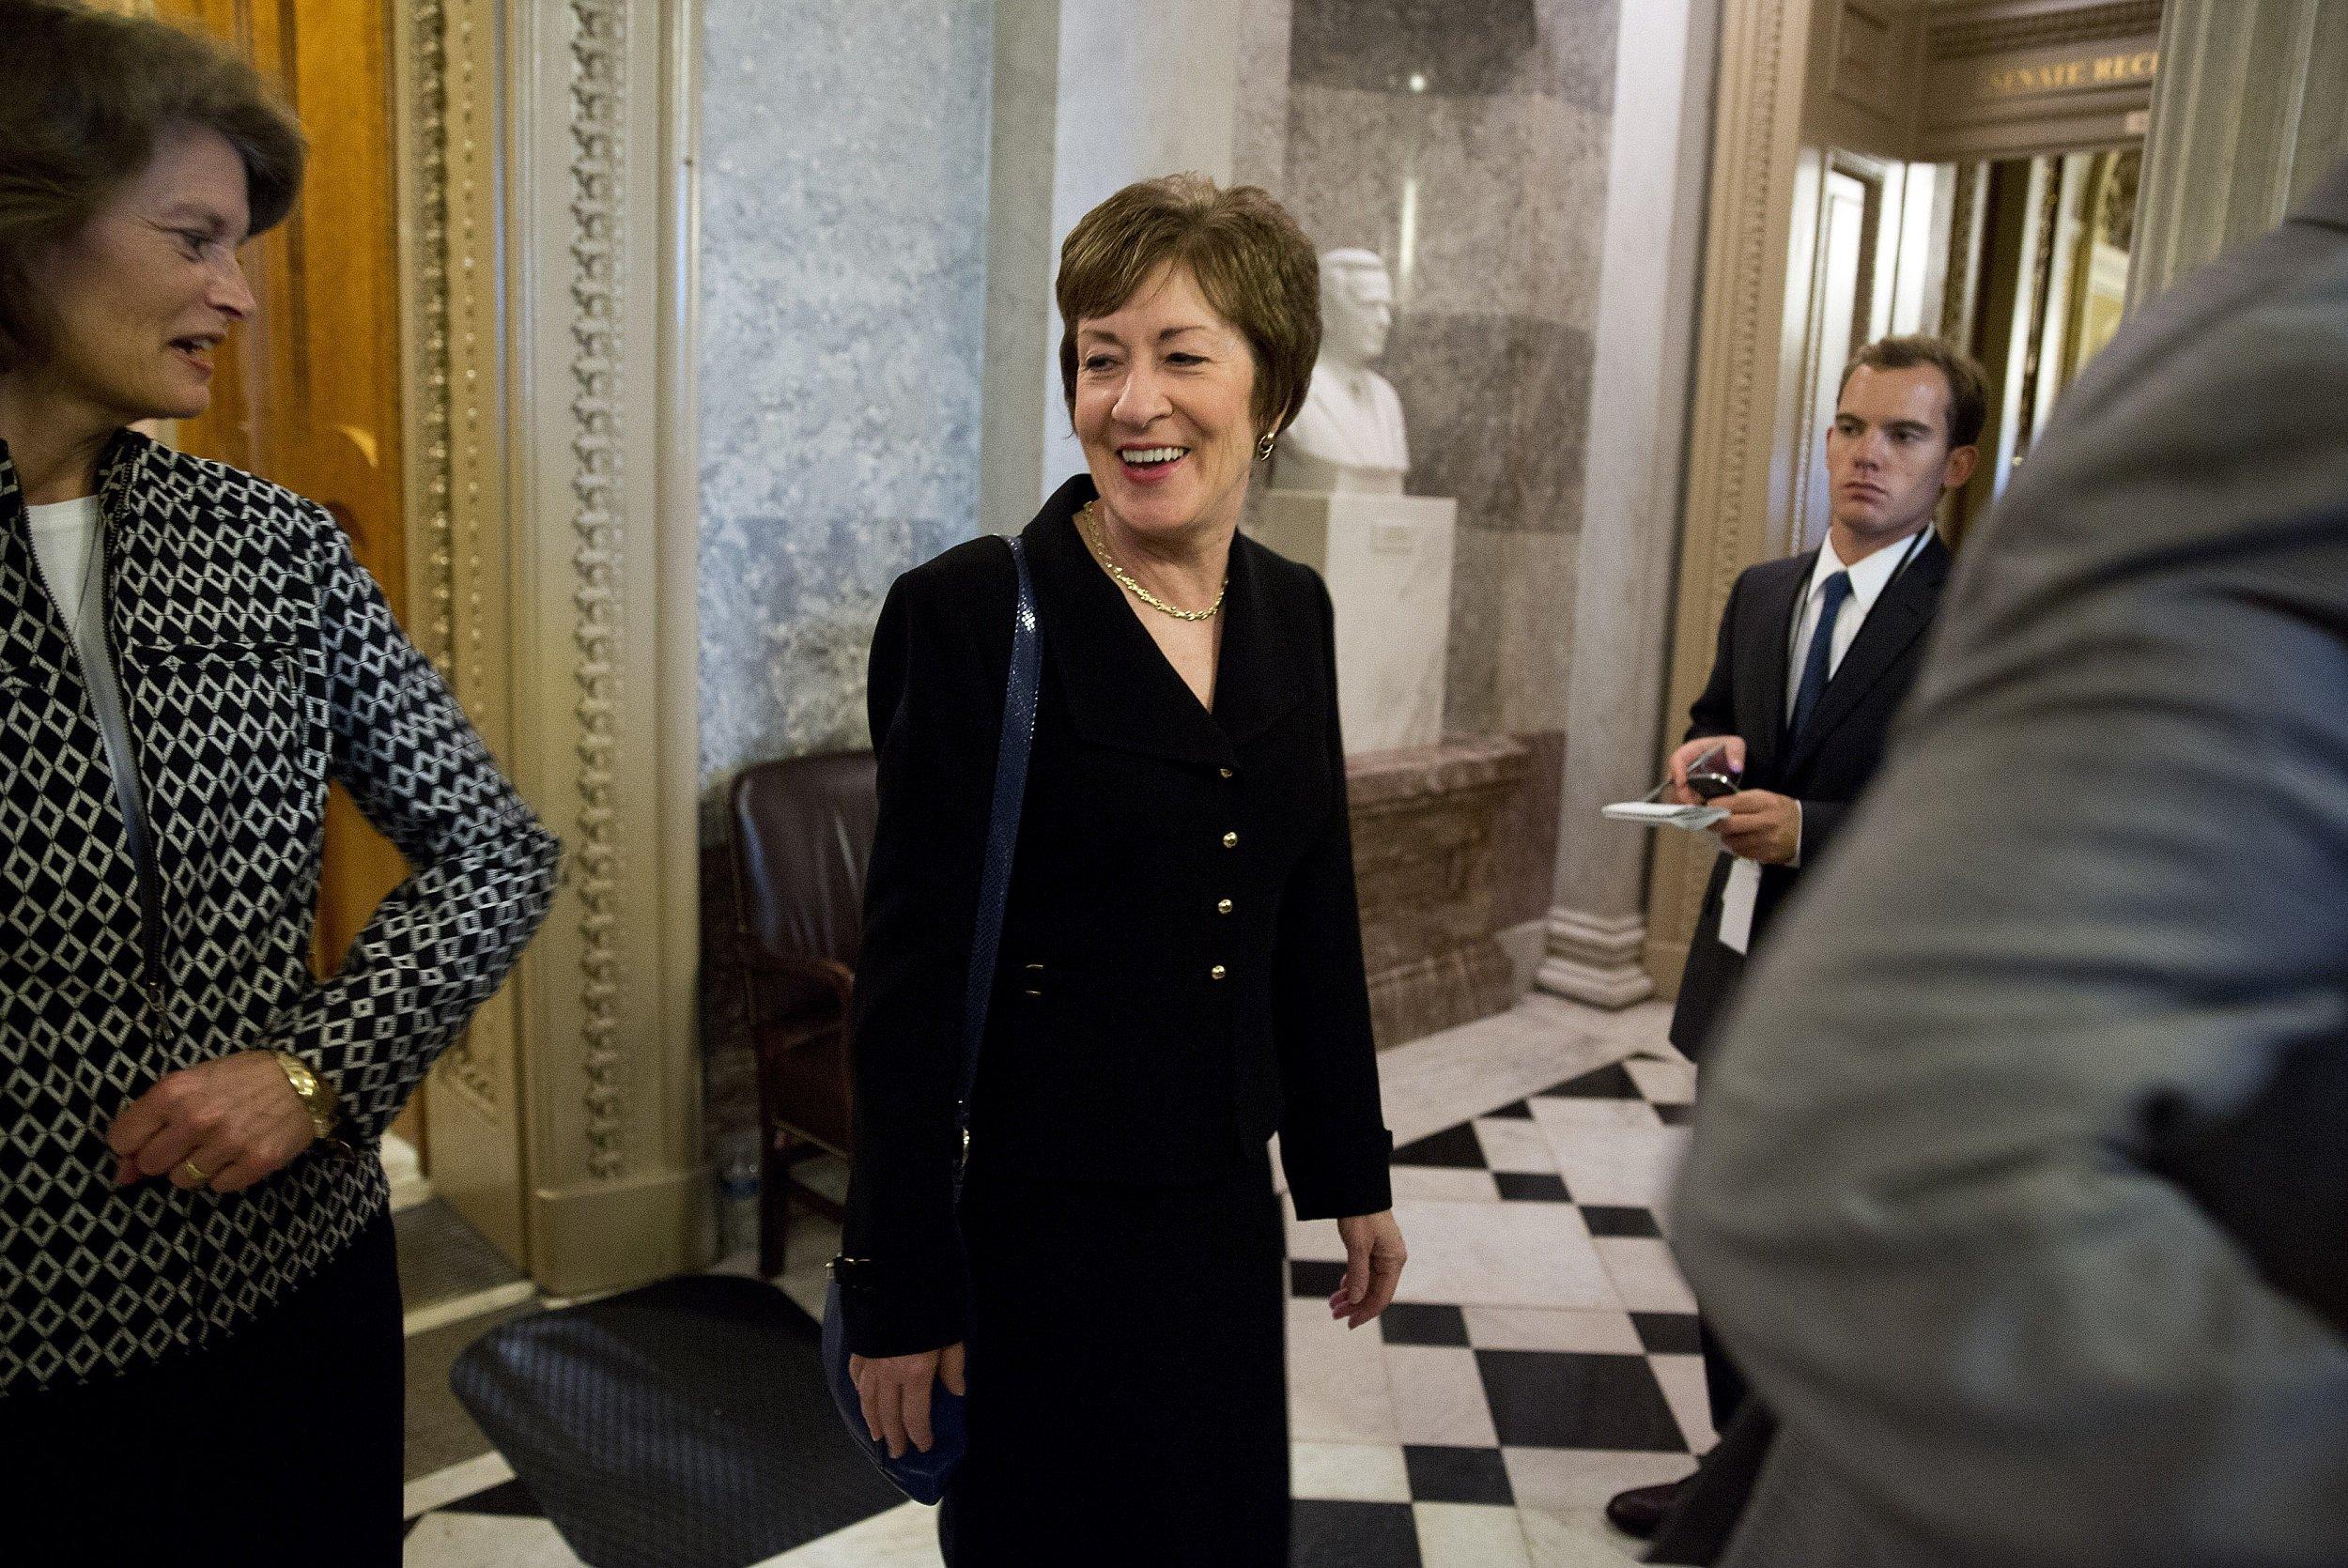 Senator Susan Collins of Maine